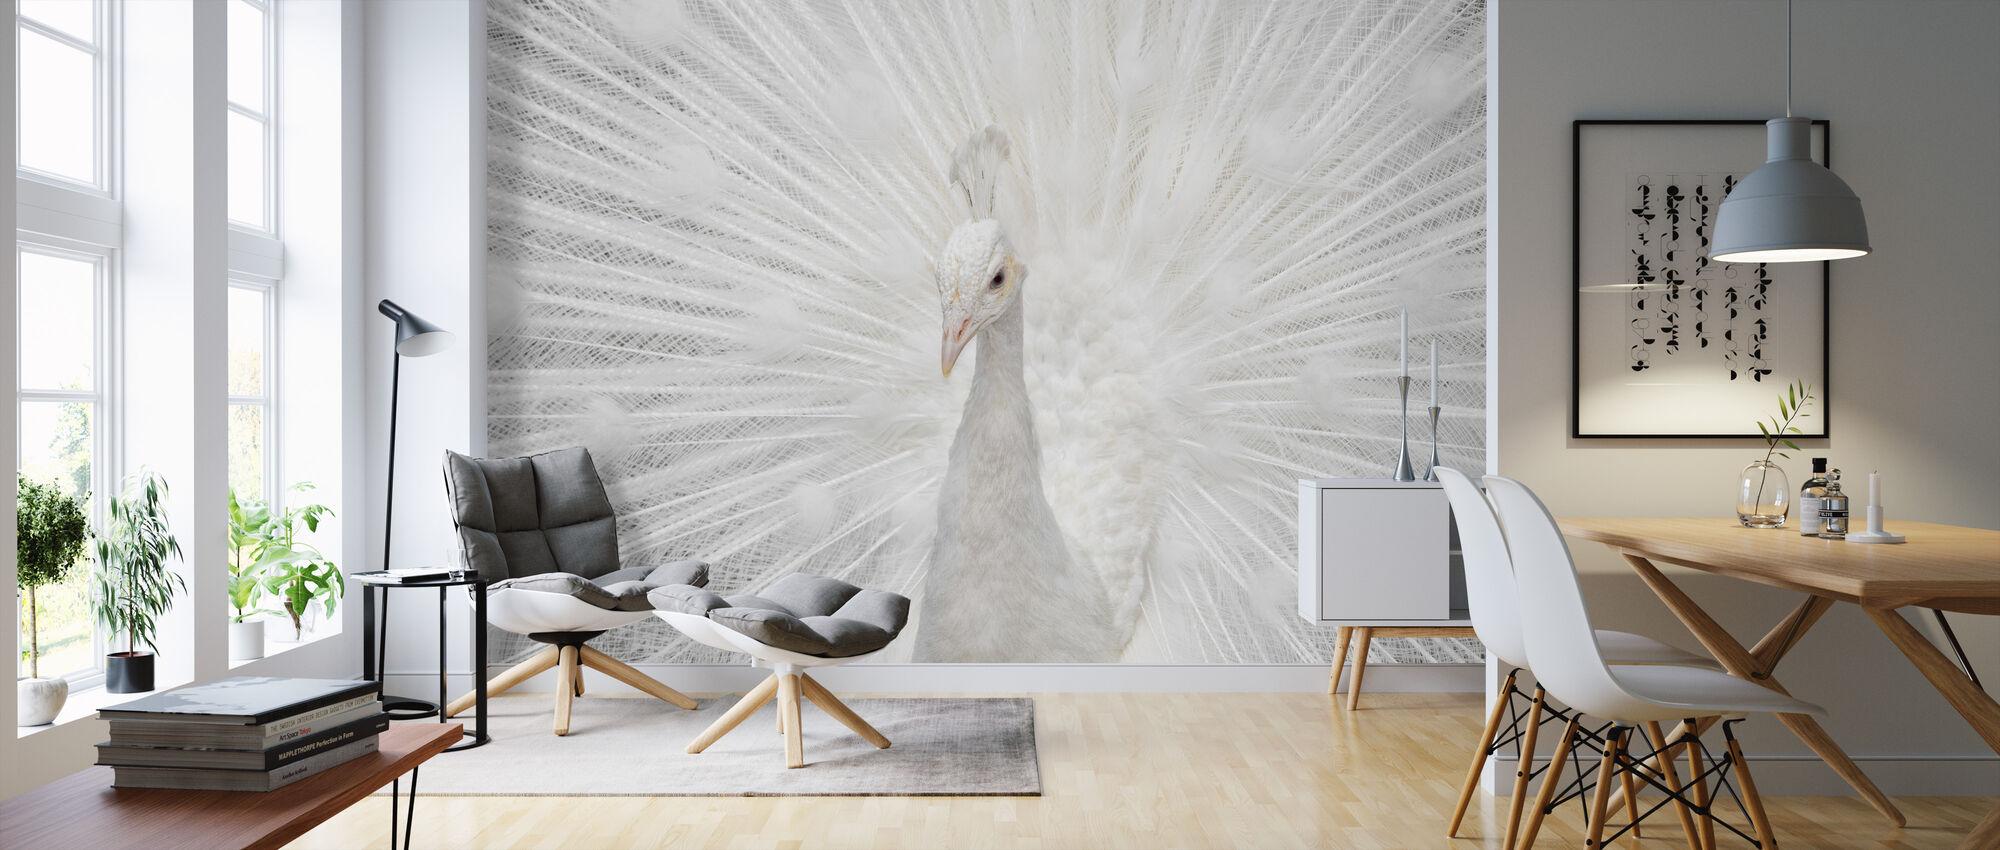 Peafowl - Wallpaper - Living Room